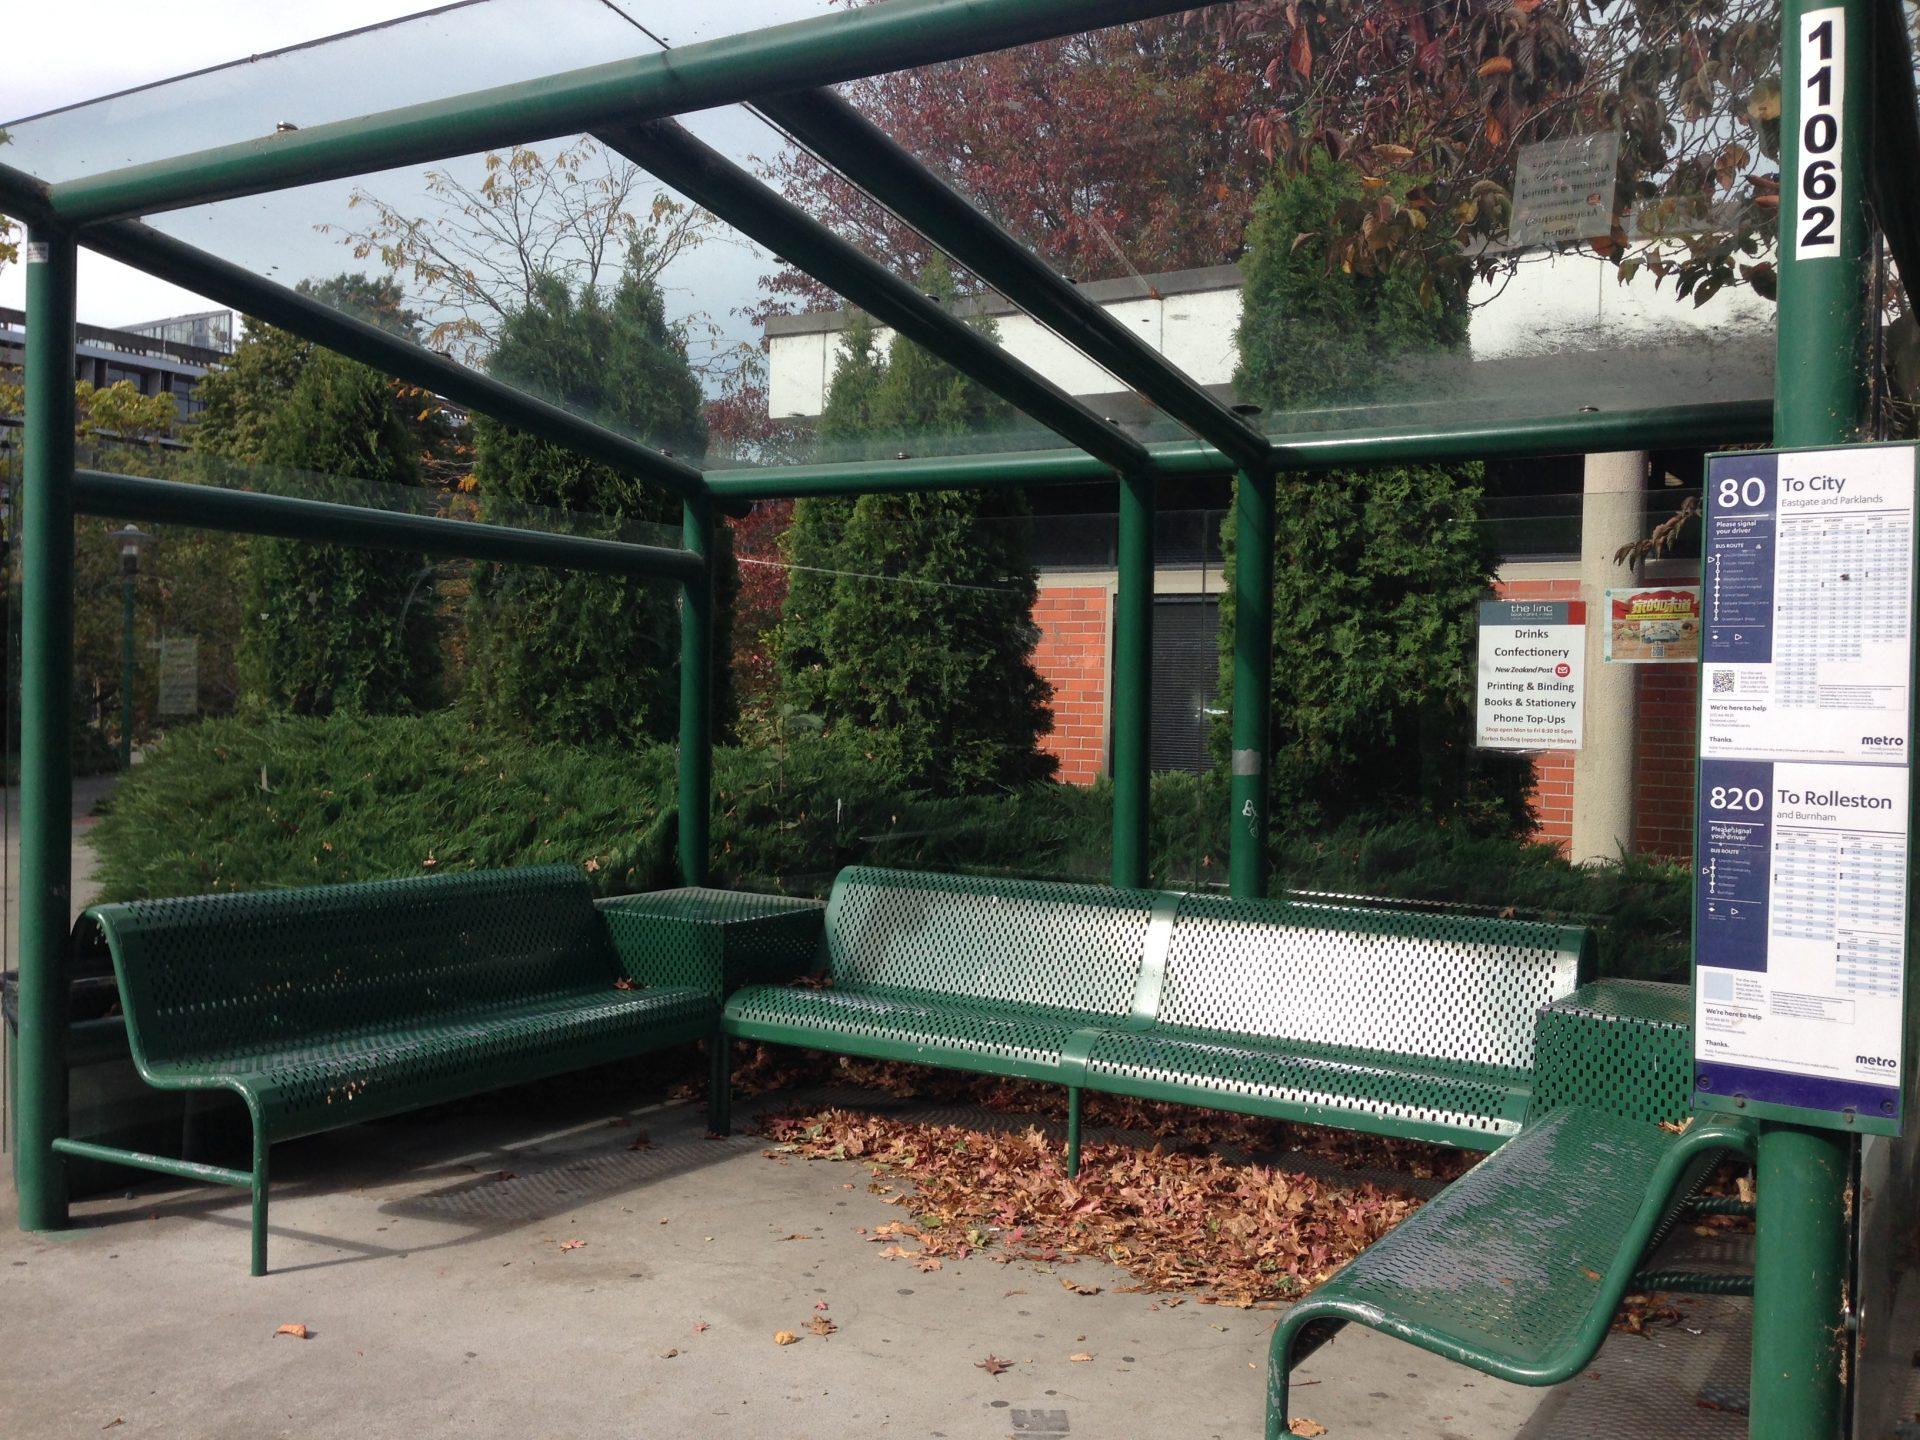 busstopinLincolnUniversity-thebroadlife-story